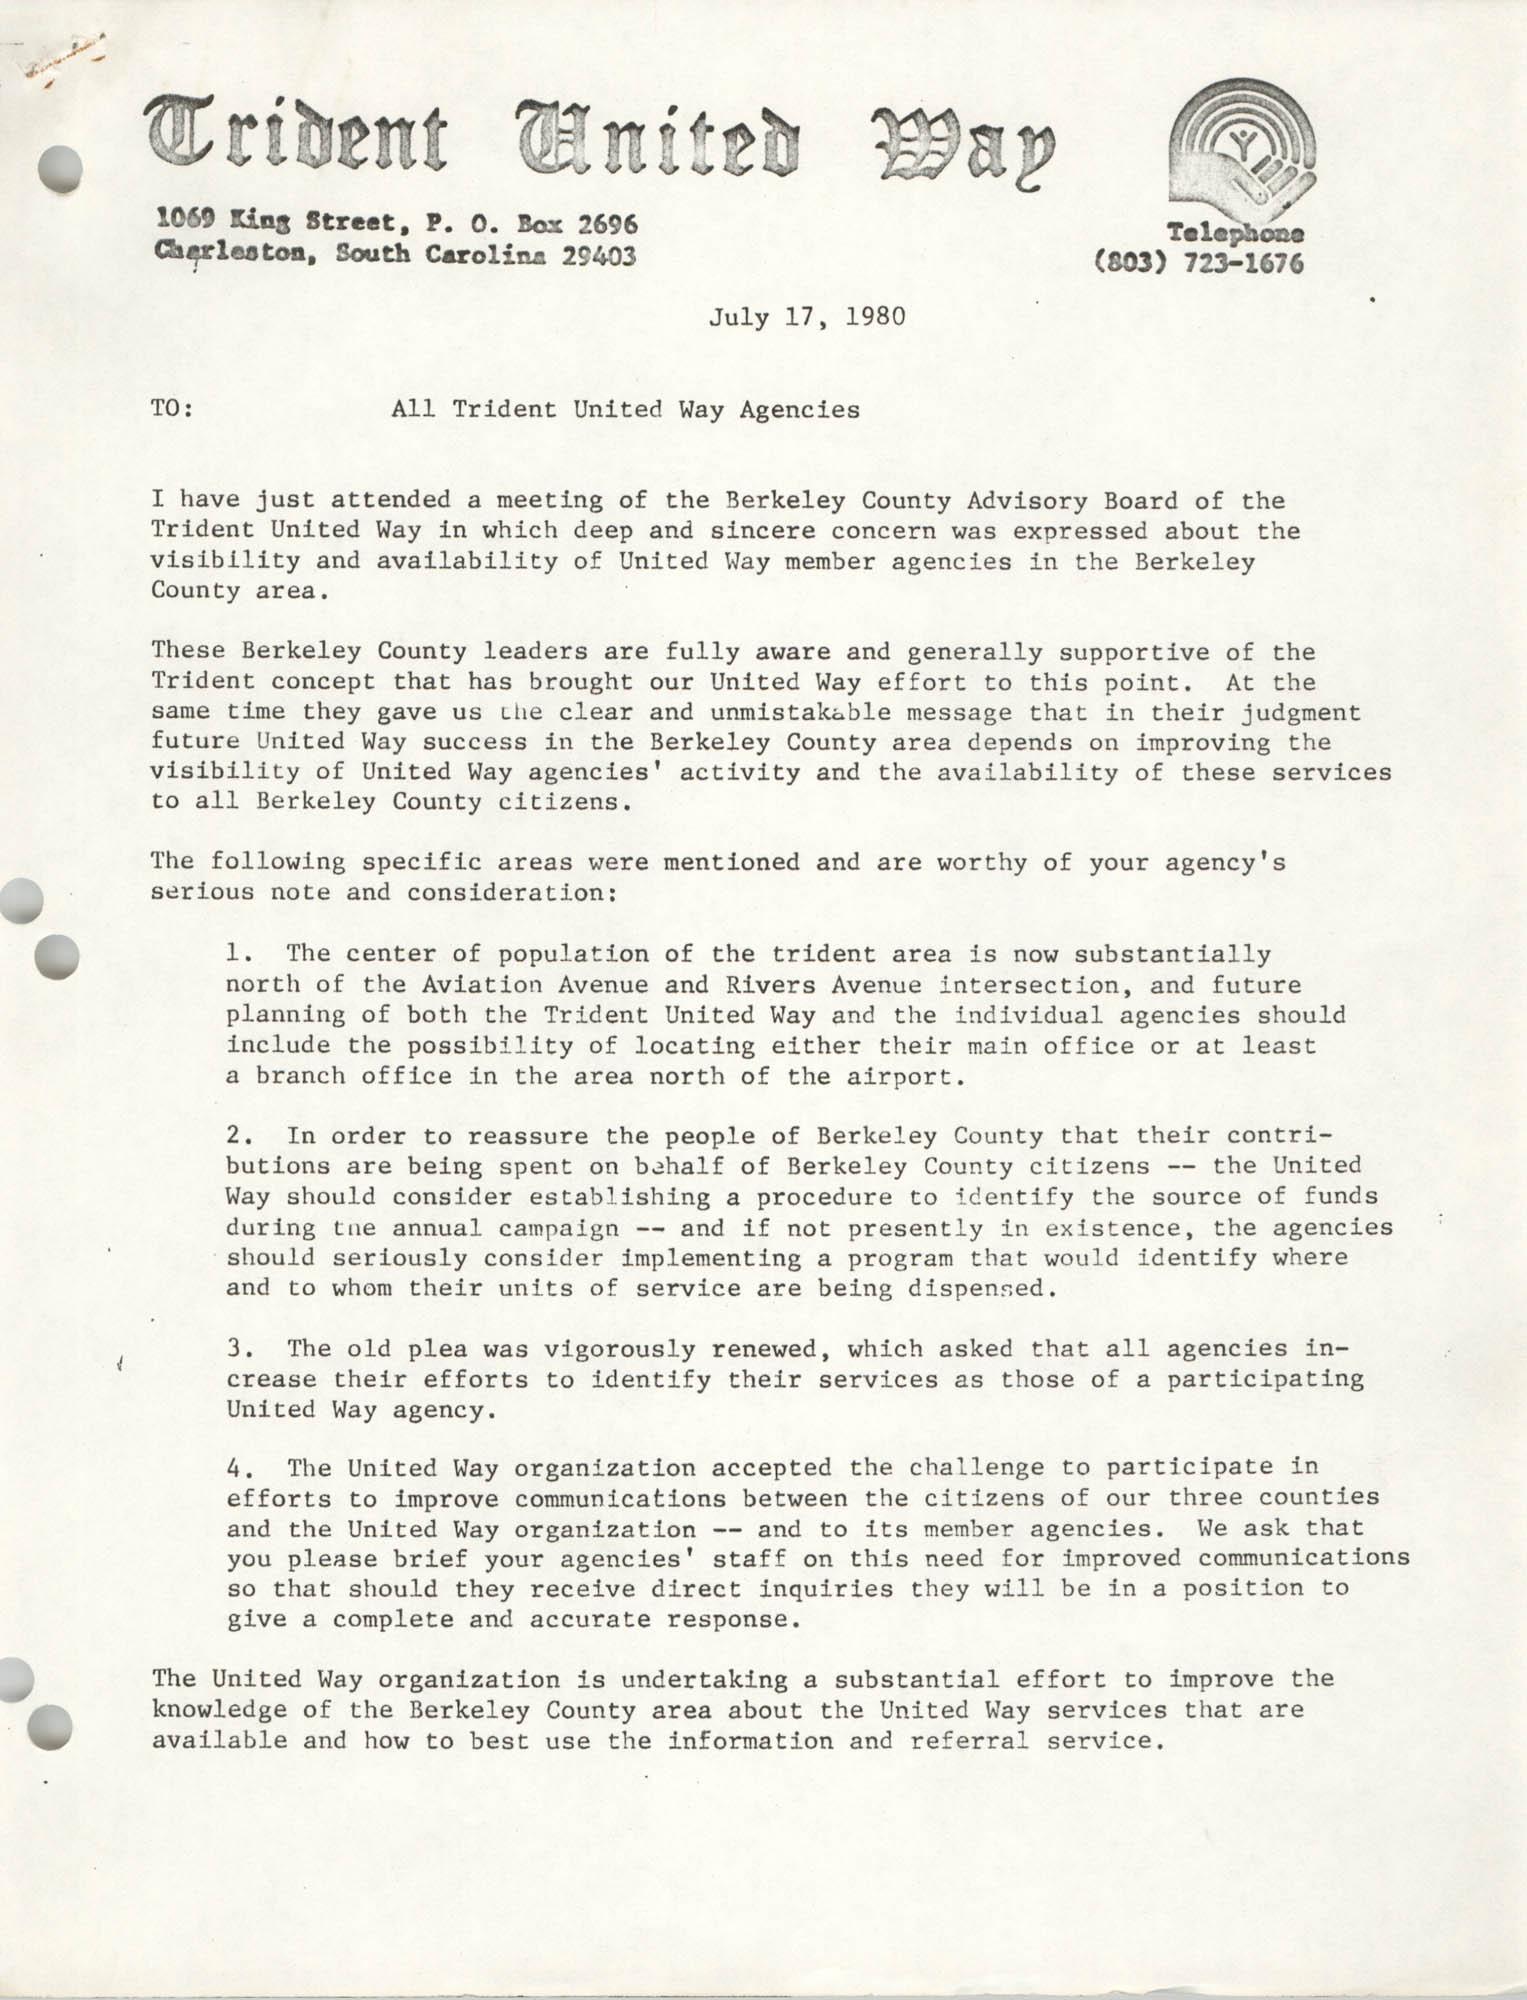 Trident United Way Memorandum, July 17, 1980